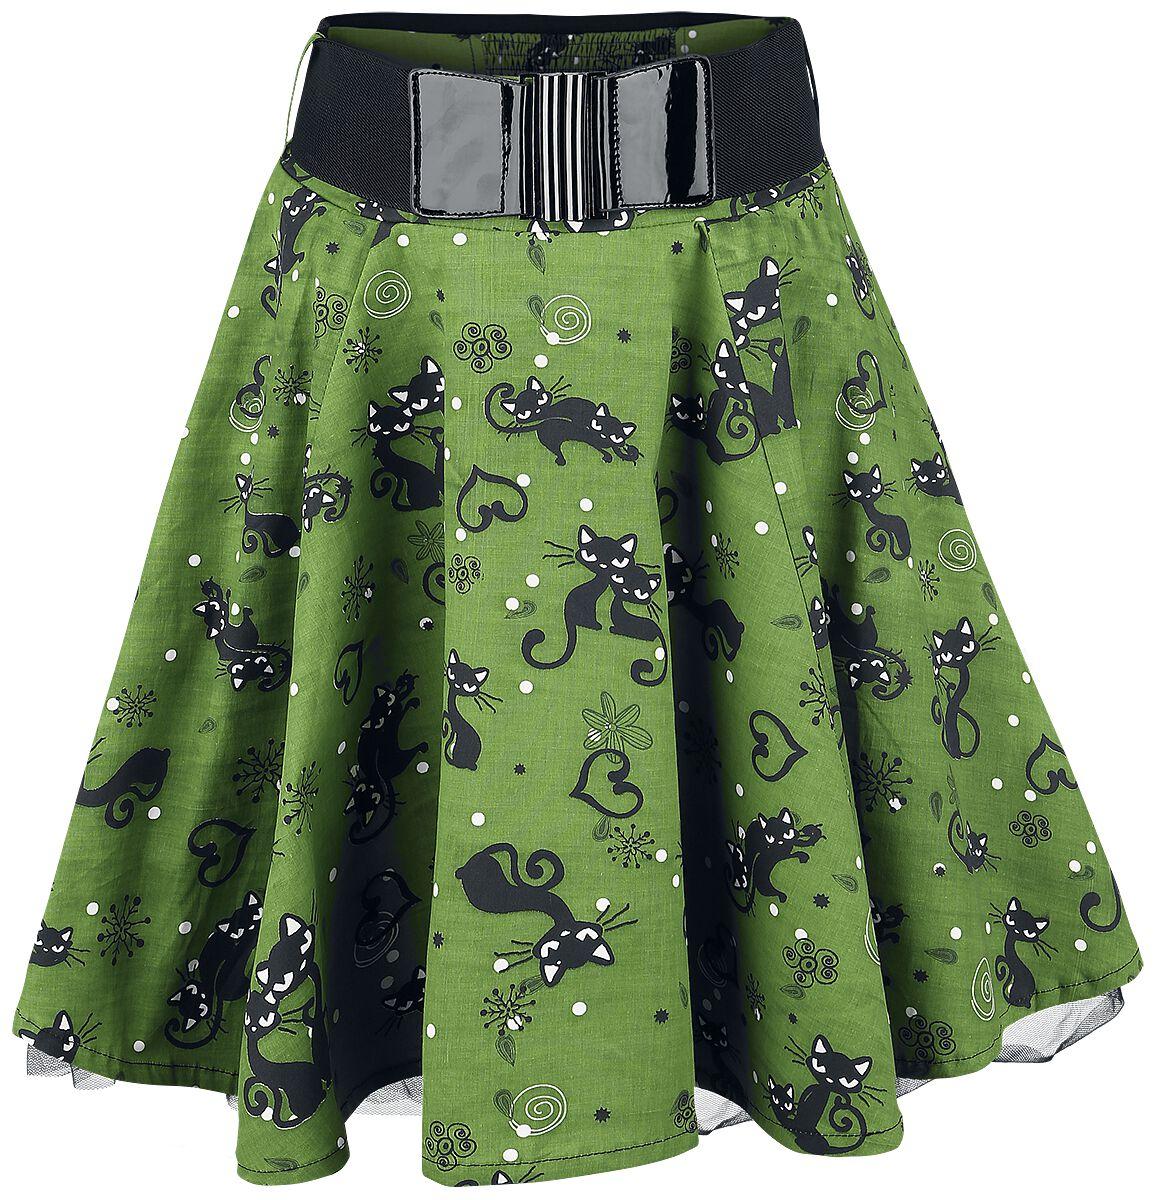 Marki - Spódnice - Spódnica Rockabella Feline Swing Spódnica zielony - 346298